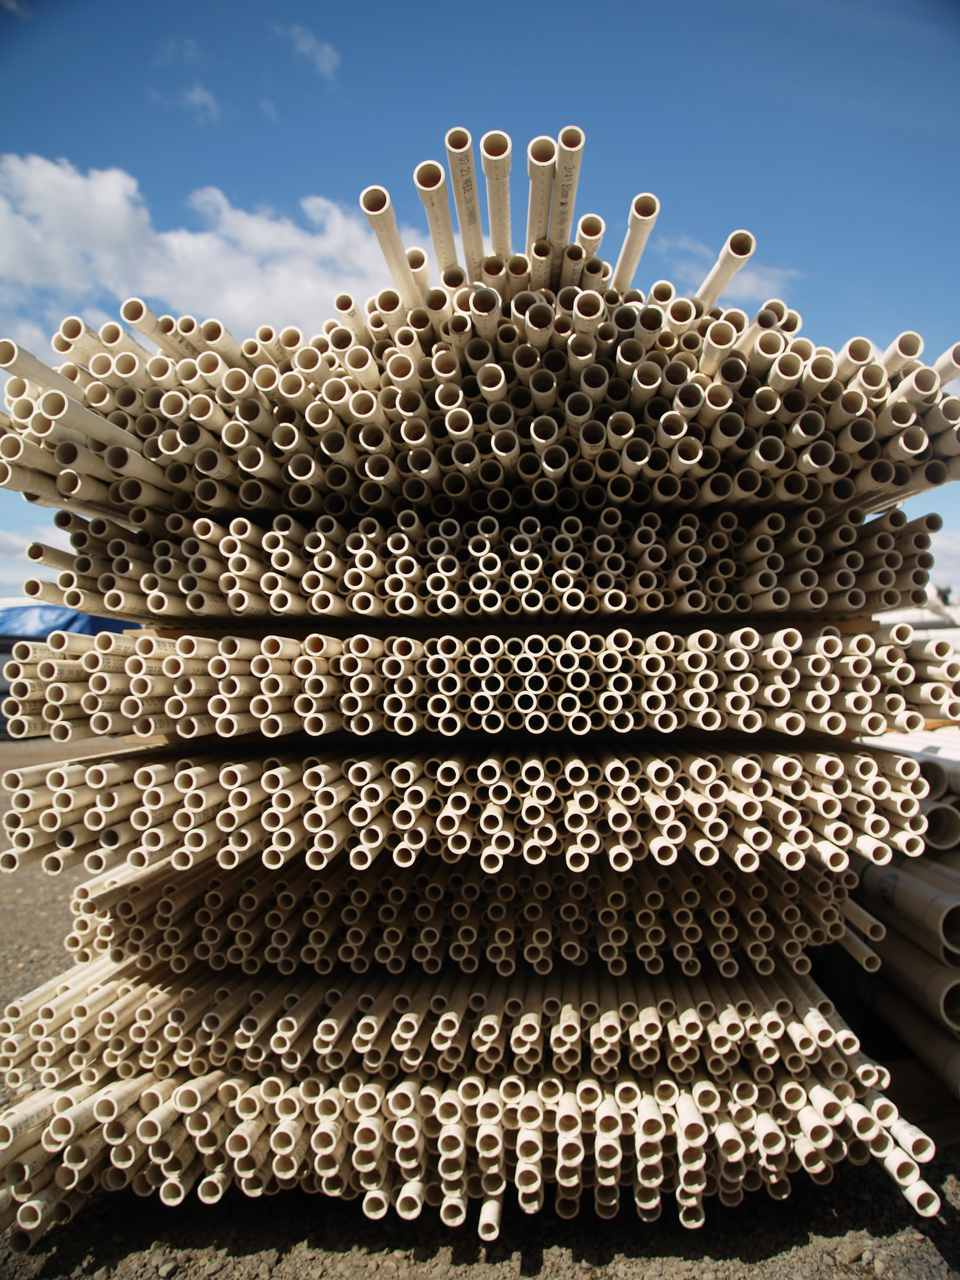 Vast stacks of PVC piping